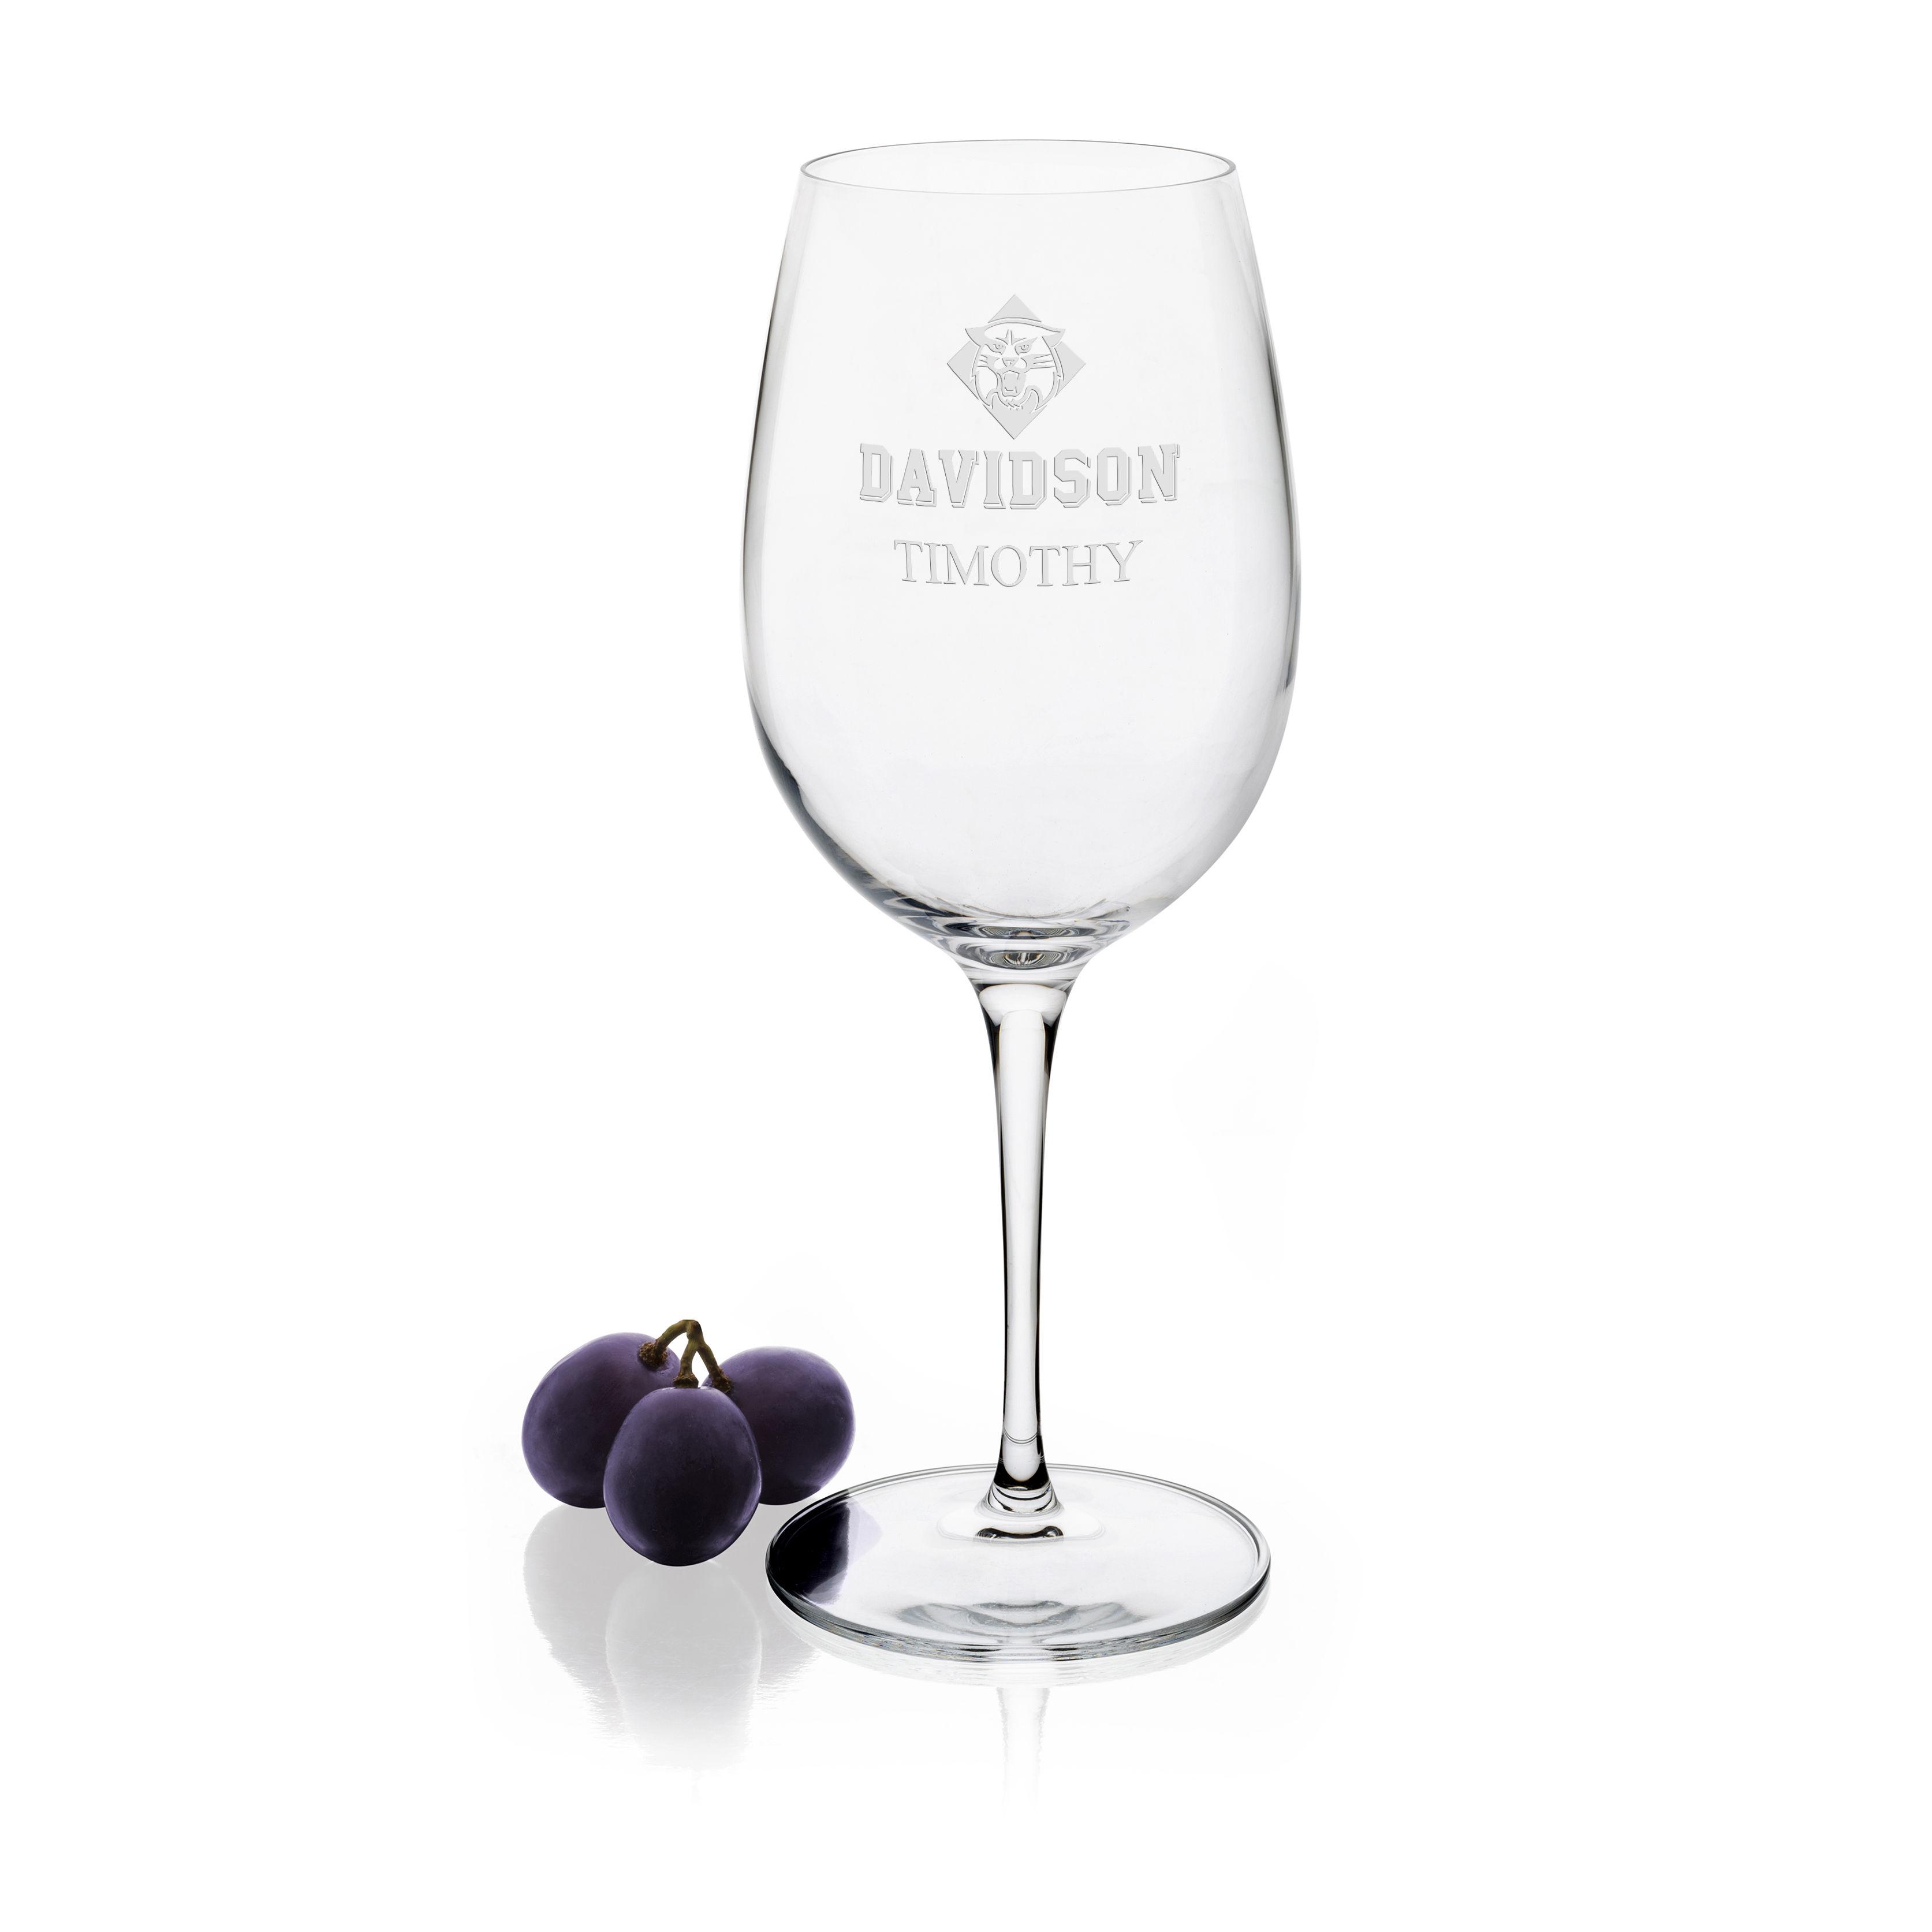 Davidson College Red Wine Glasses - Set of 4